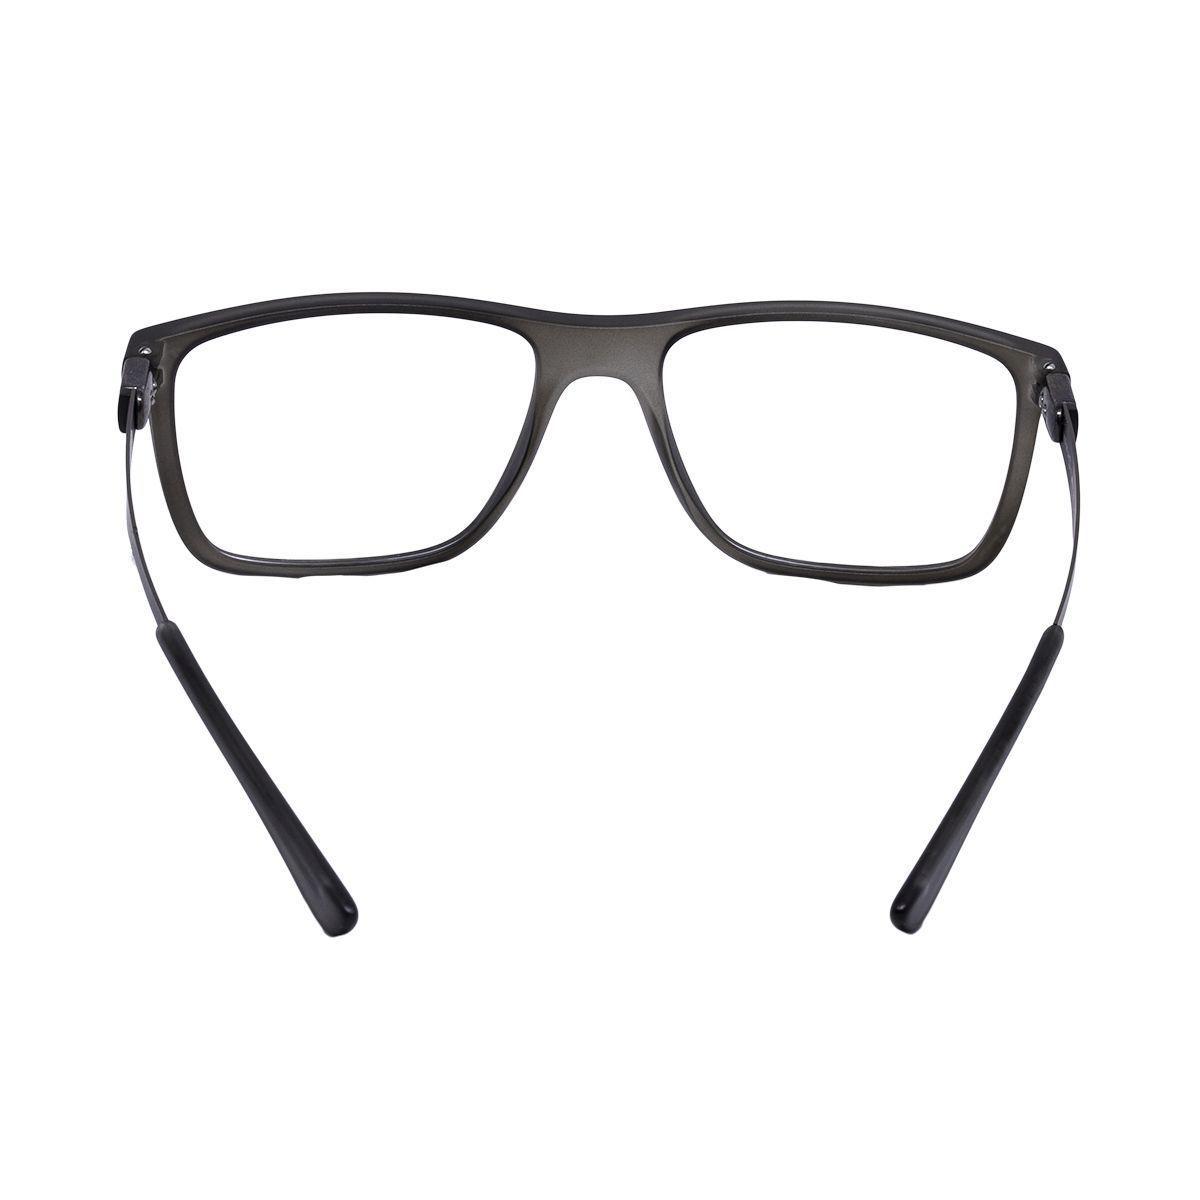 aa1d234bd Óculos de Grau HB Duotech Masculino M.93138 297 - Acetato Cinza - Hb - hot  butterd R$ 328,00 à vista. Adicionar à sacola